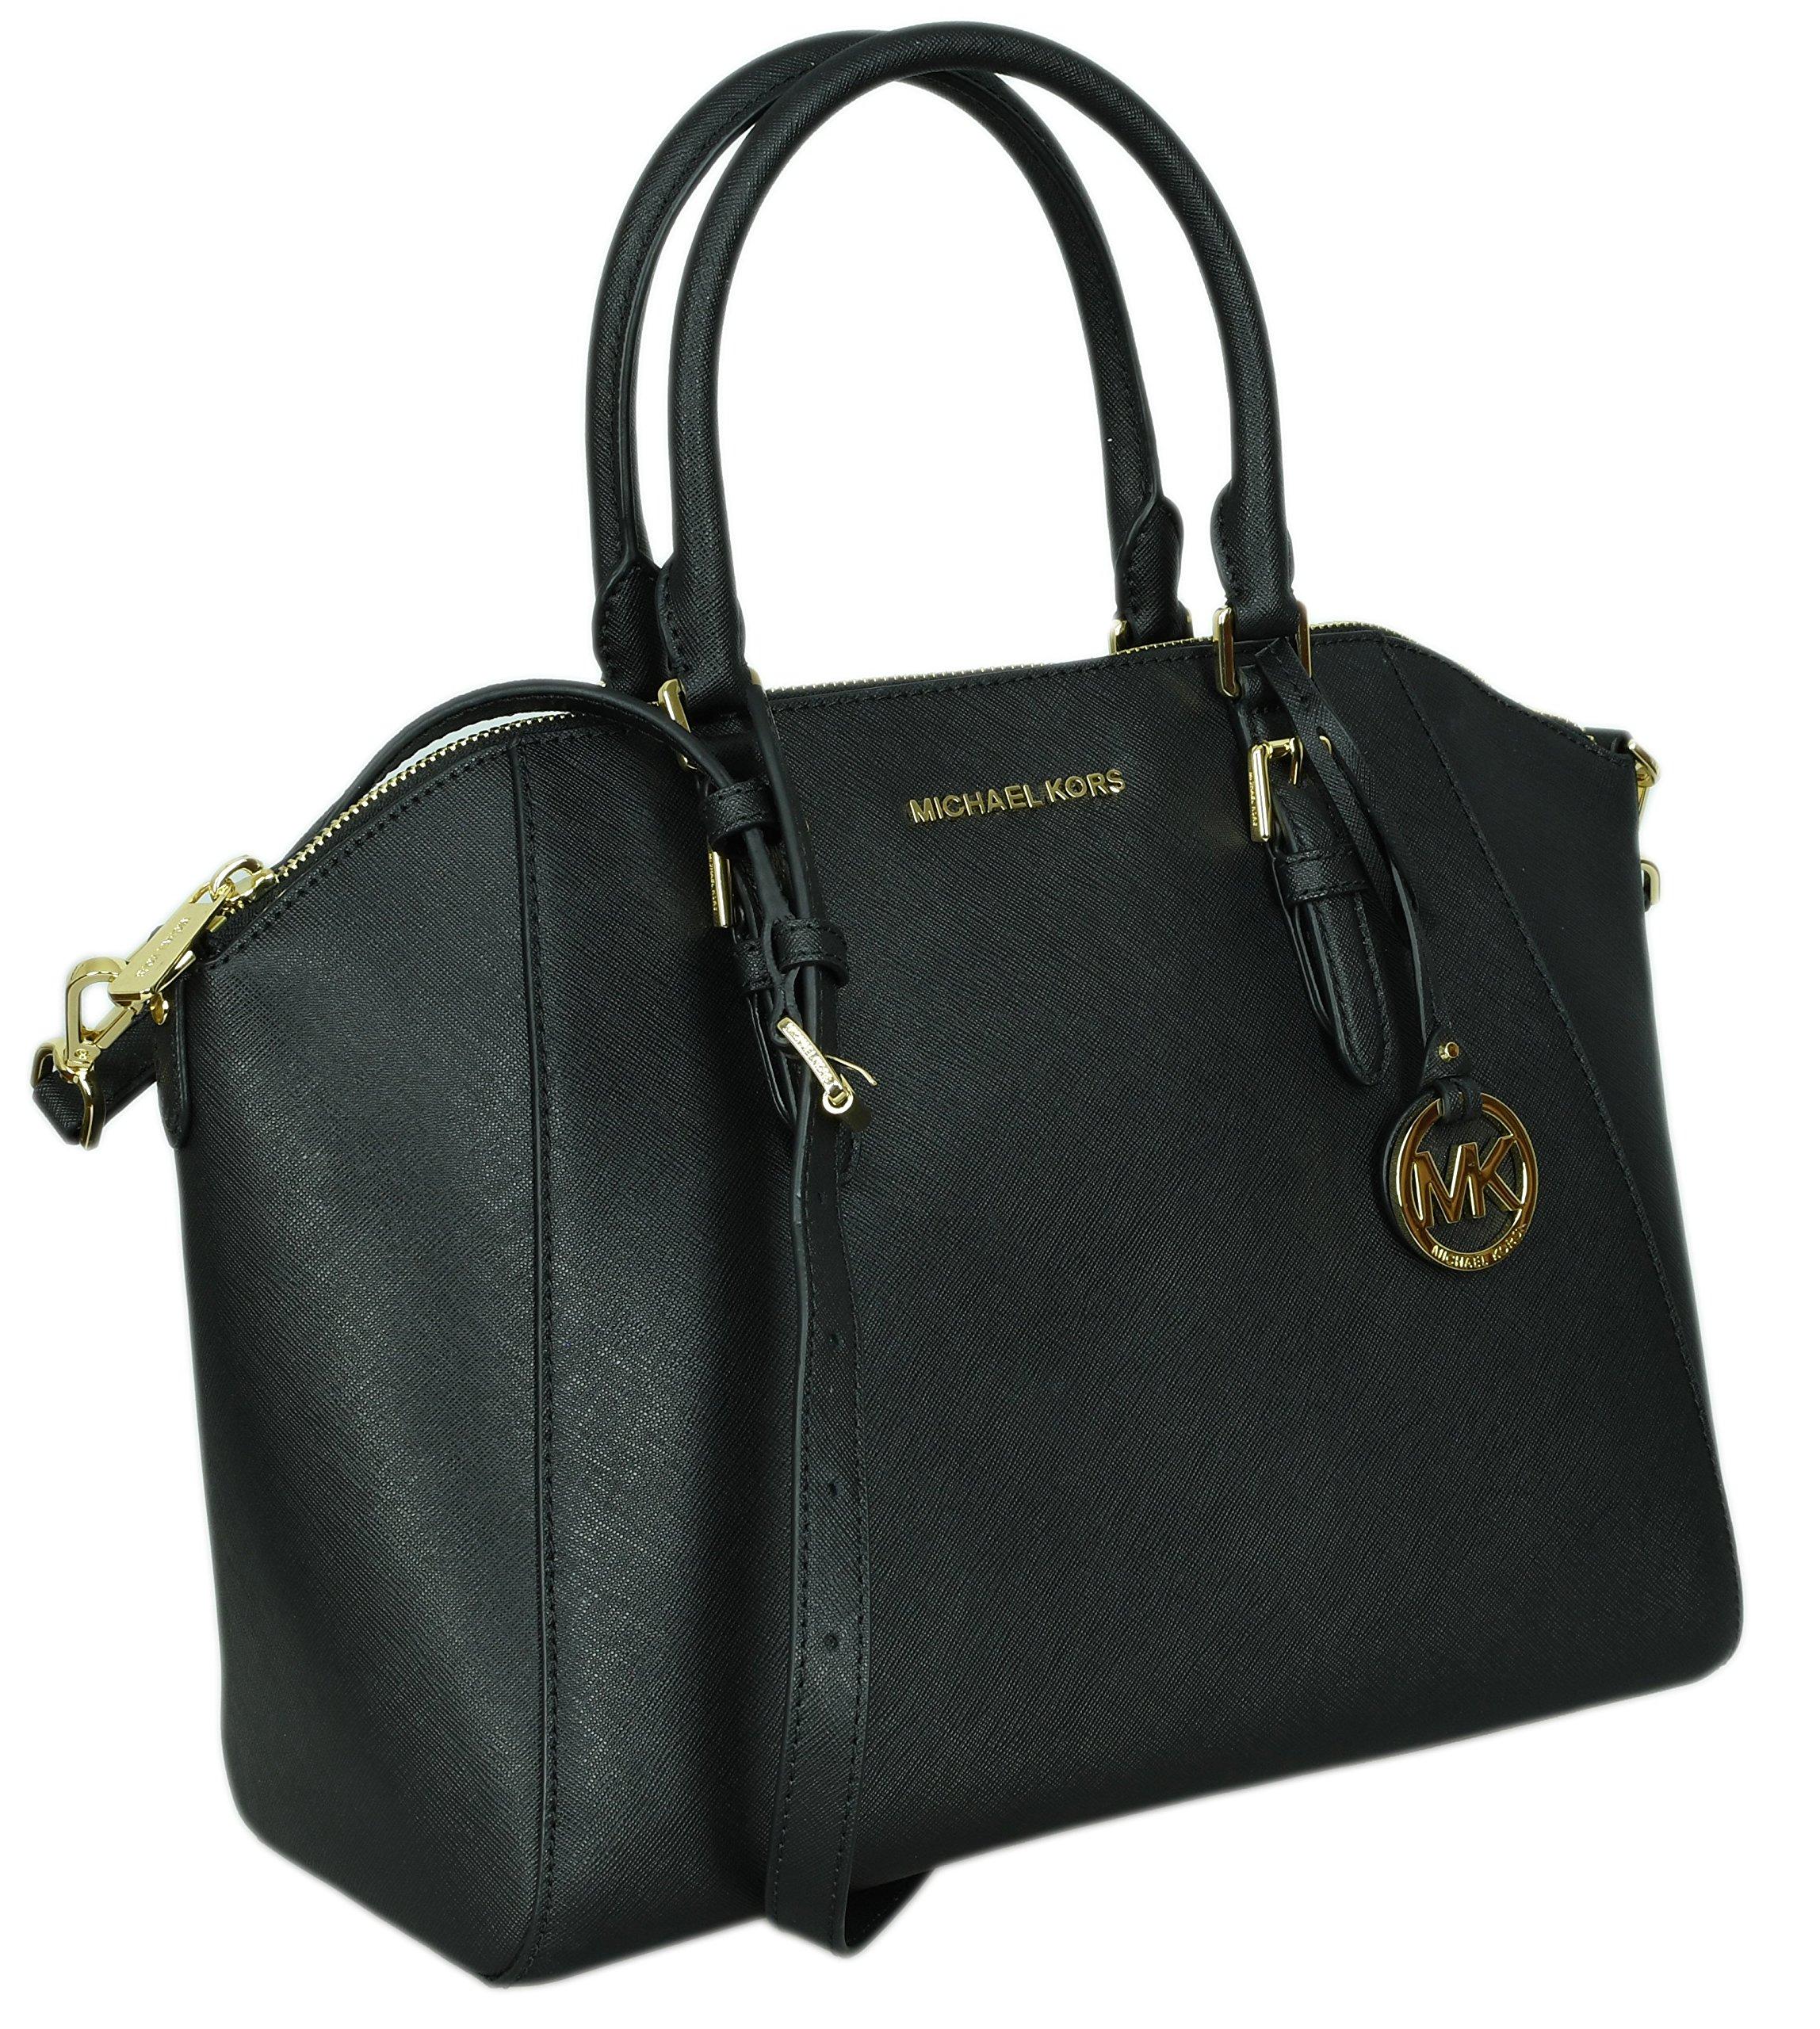 Michael Kors Large Ciara Saffiano Leather Womens Satchel Shoulder Bag (Black)